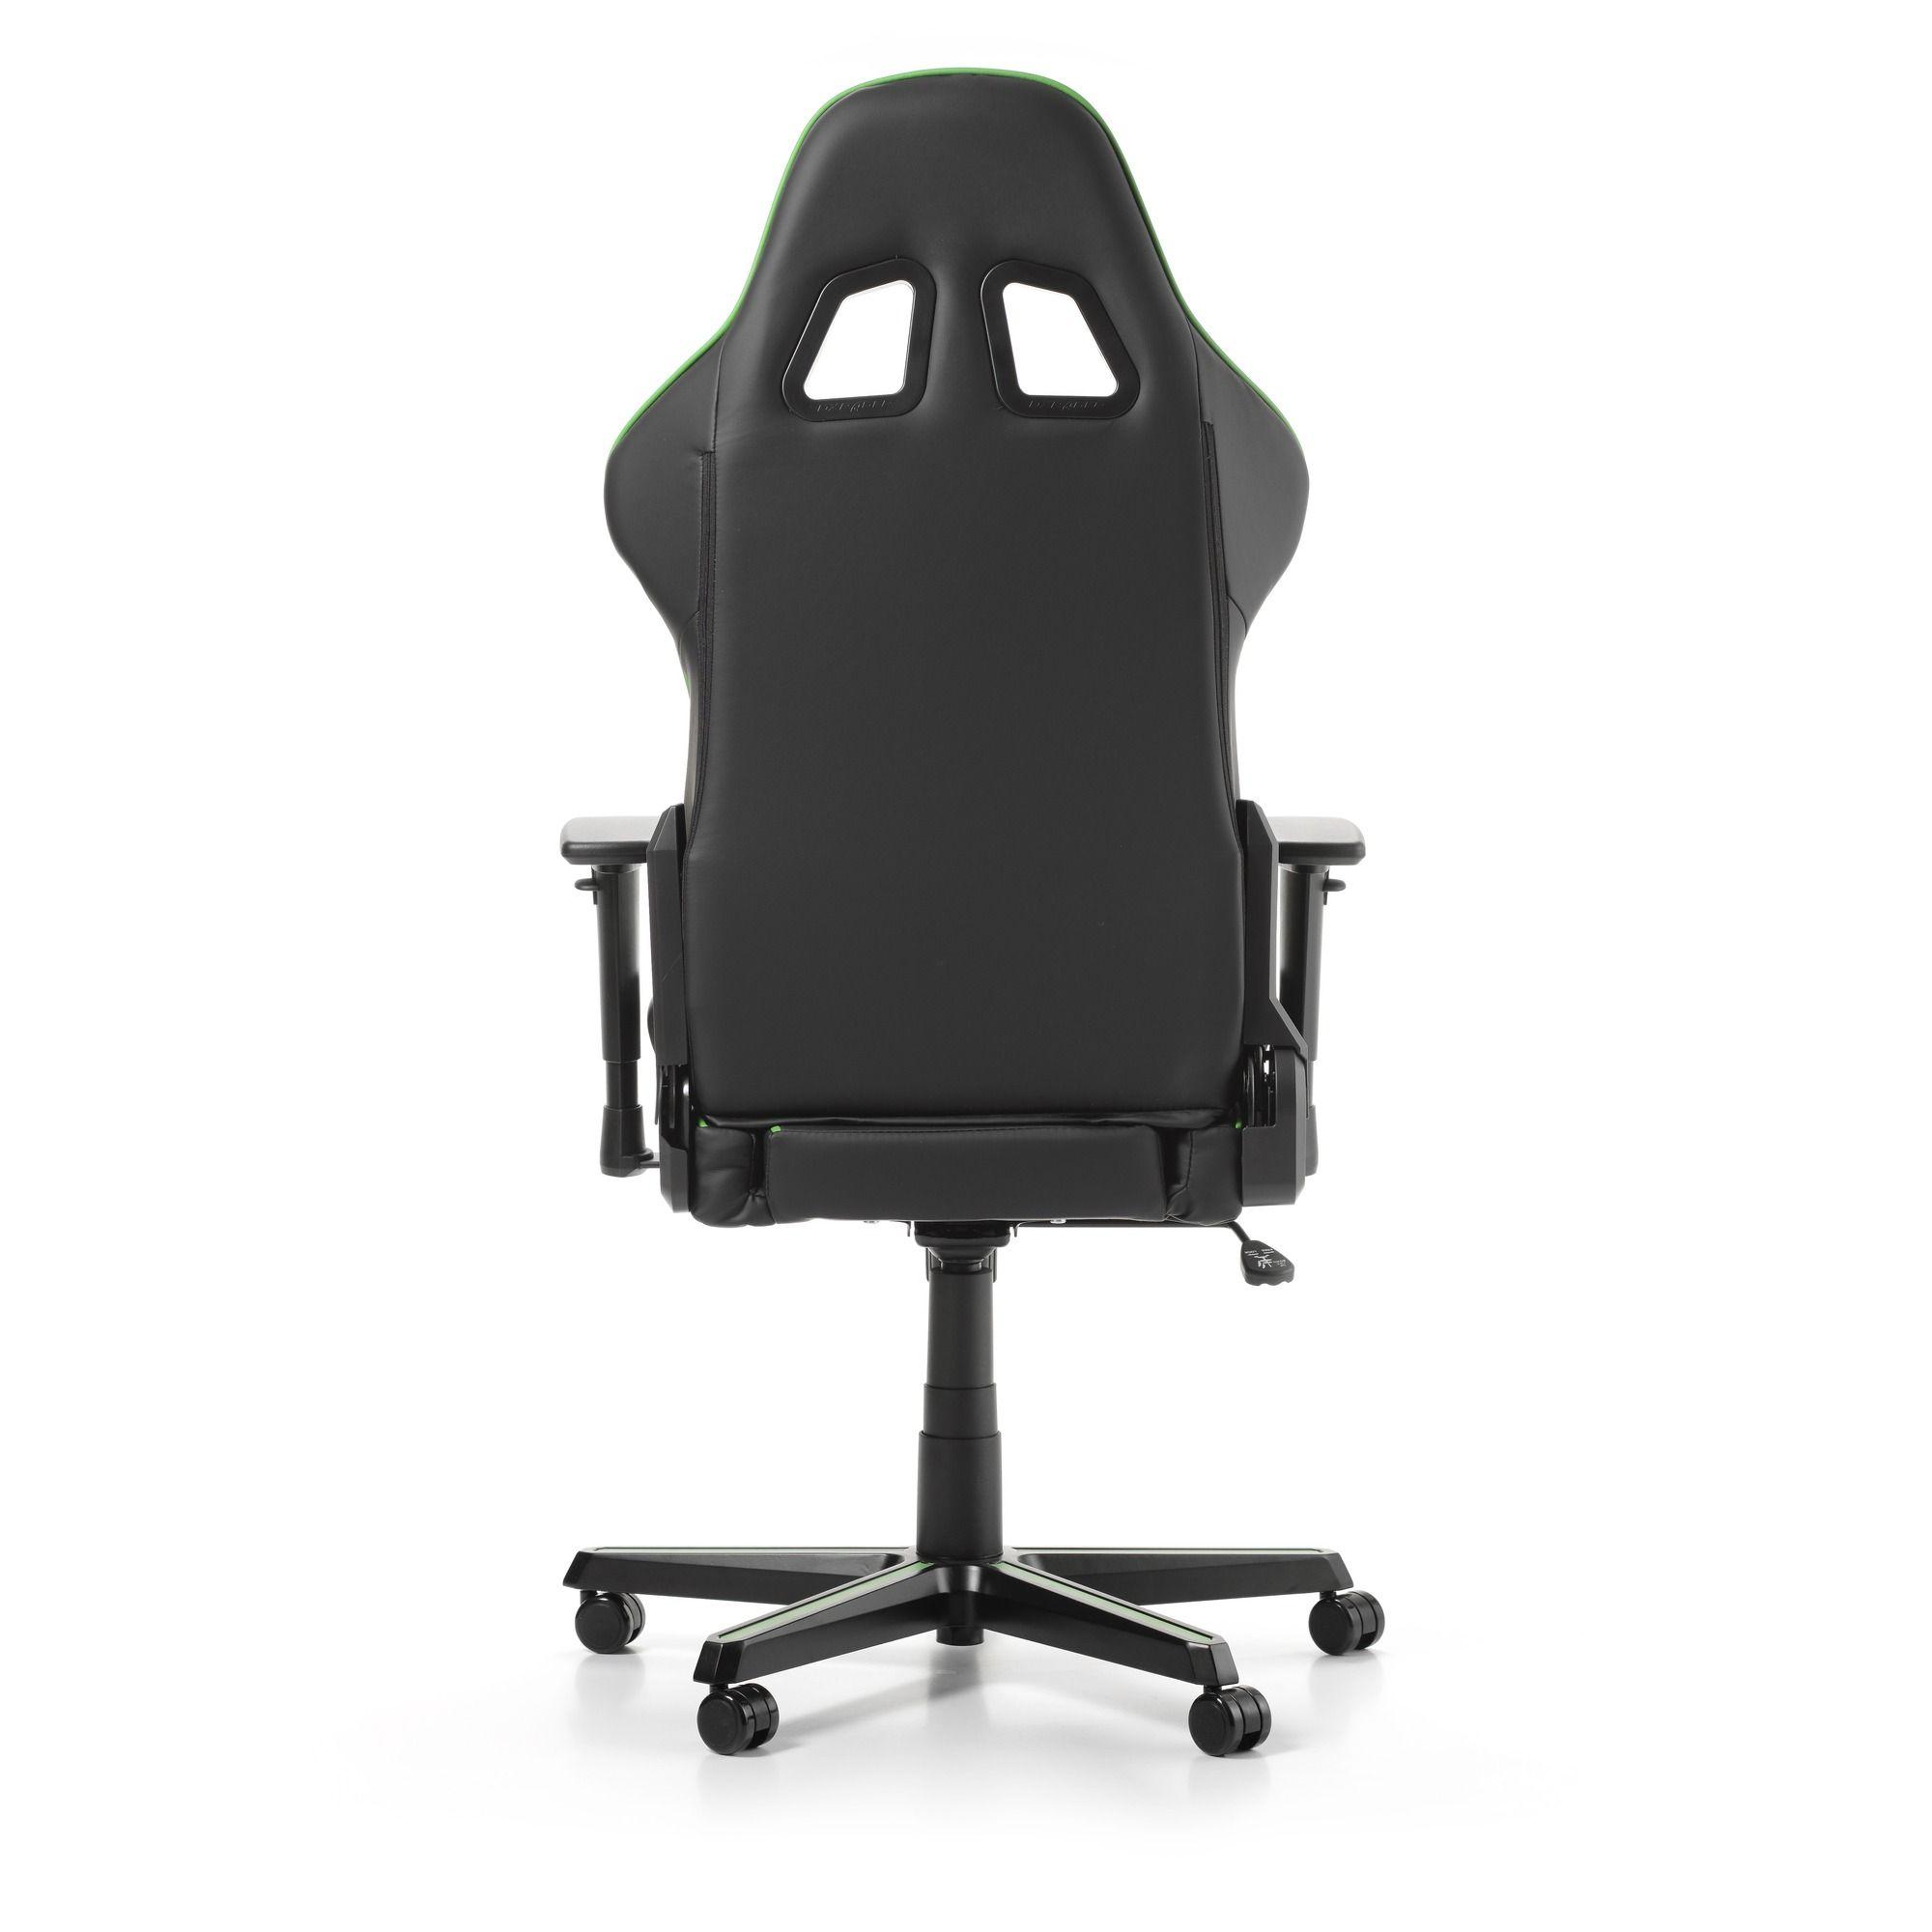 Геймърски стол DXRacer - серия FORMULA, черен/зелен - OH/FH08/NE - 12